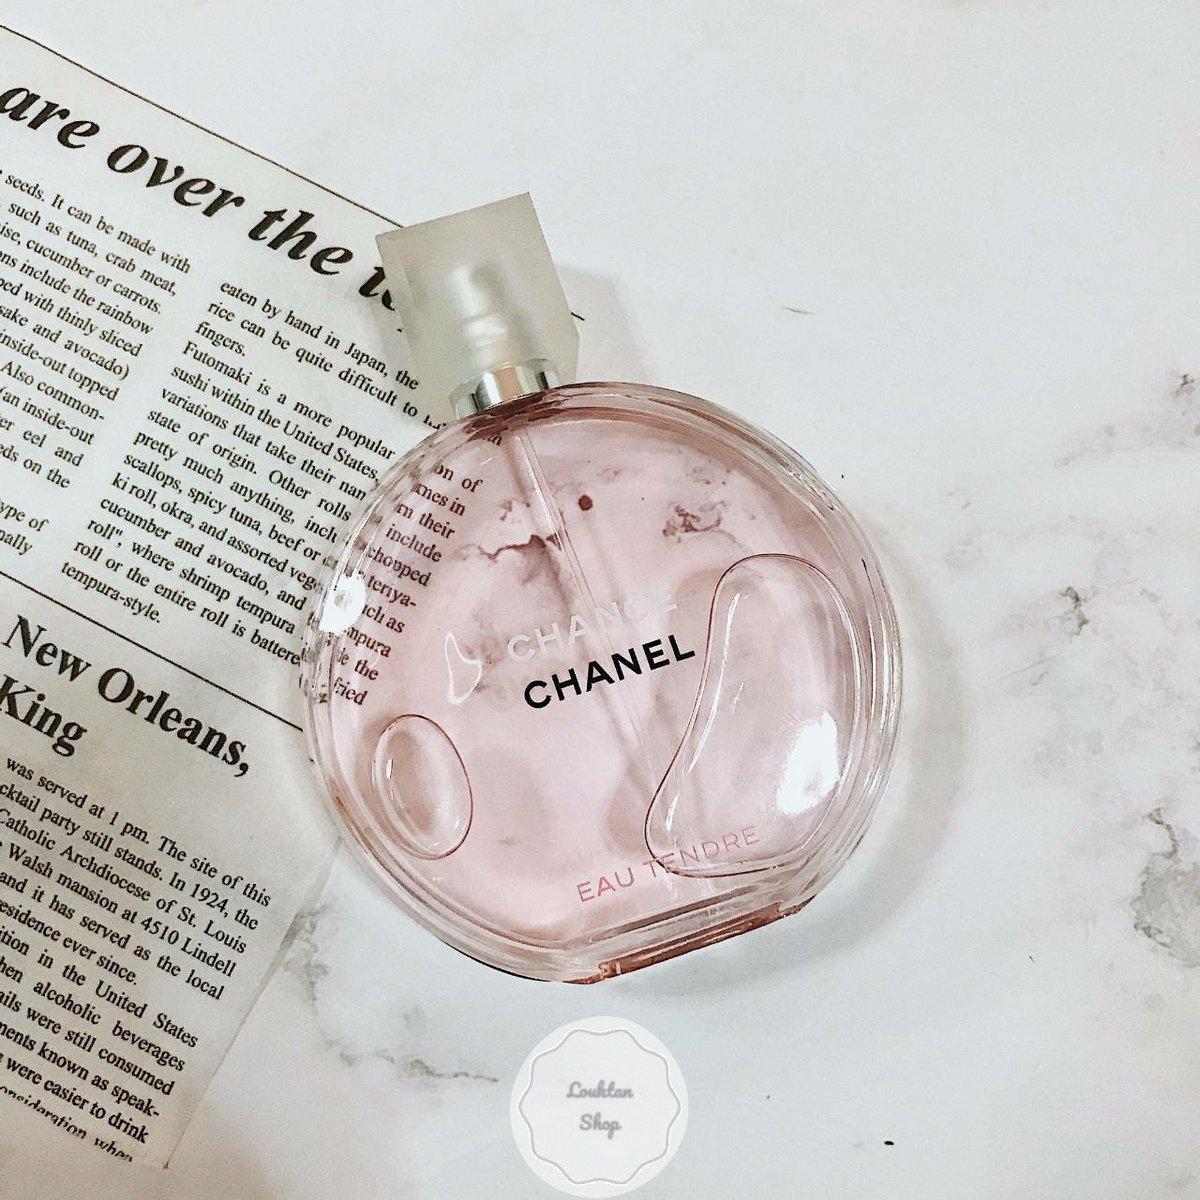 #NCT2020_YearParty #NCT2020 อซทซ.คนไหนสนใจน้ำหอม ทักมานะคะ เดี๋ยวเราลดให้😍  IG : Louktanshop https://t.co/5EI5OfBuss  #น้ำหอมแท้100 #น้ำหอมเคาน์เตอร์ราคาถูก #น้ำหอมยอดฮิต #ตามหาน้ำหอม #perfume #chanel #YSL #ตลาดนัดnctdream #ตลาดนัดwayv #ตลาดนัดอซท https://t.co/4M0iwLkdvN